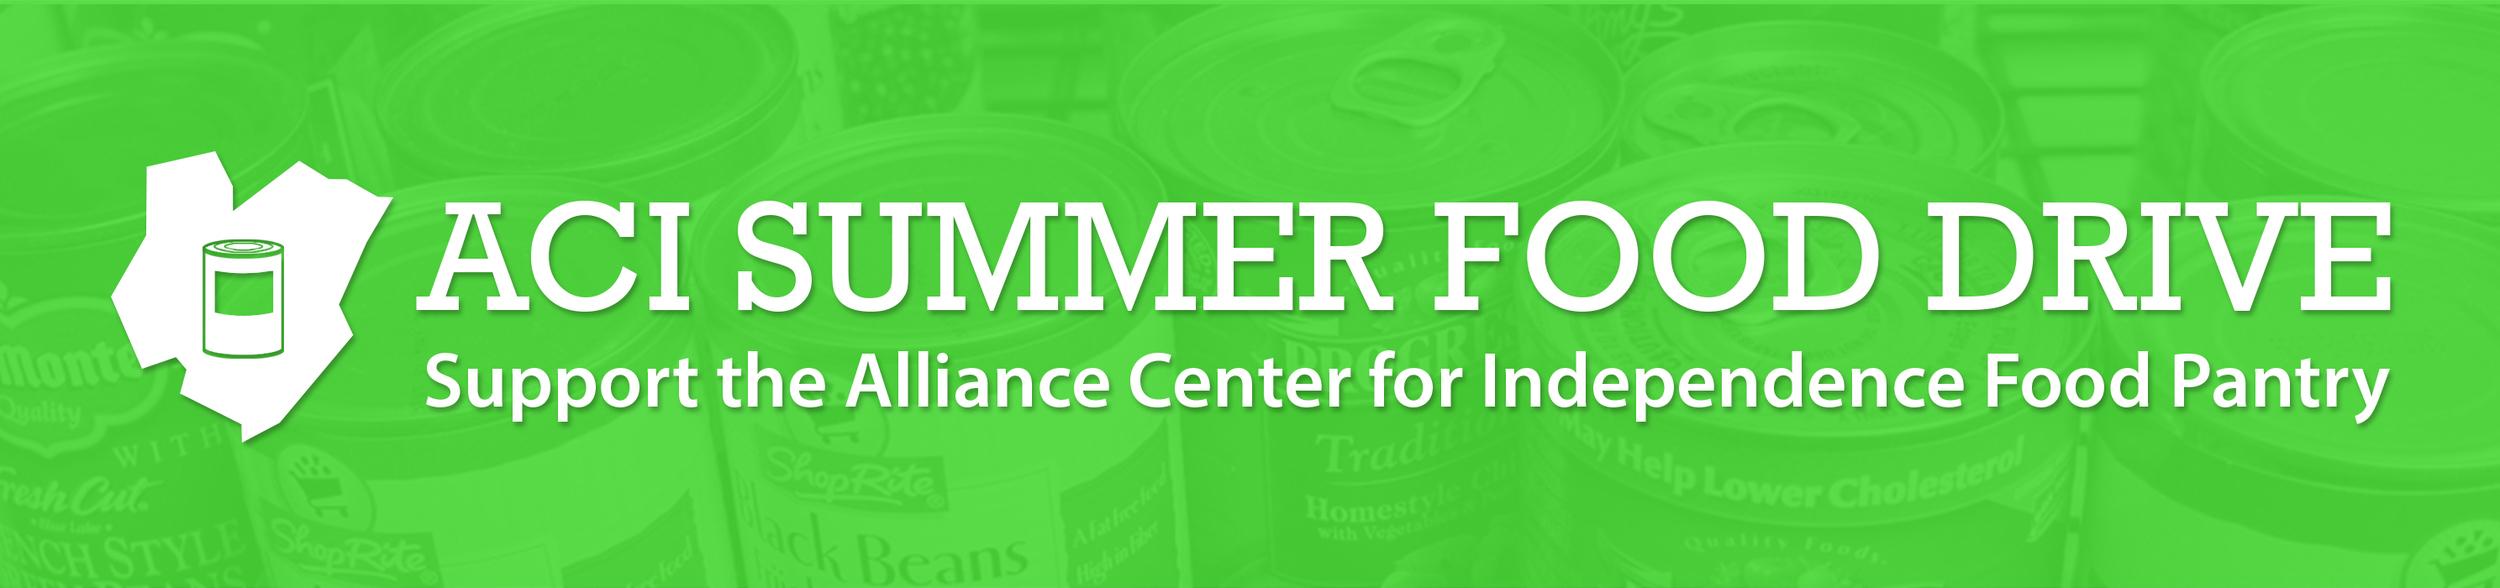 ACI Spring Food Drive banner